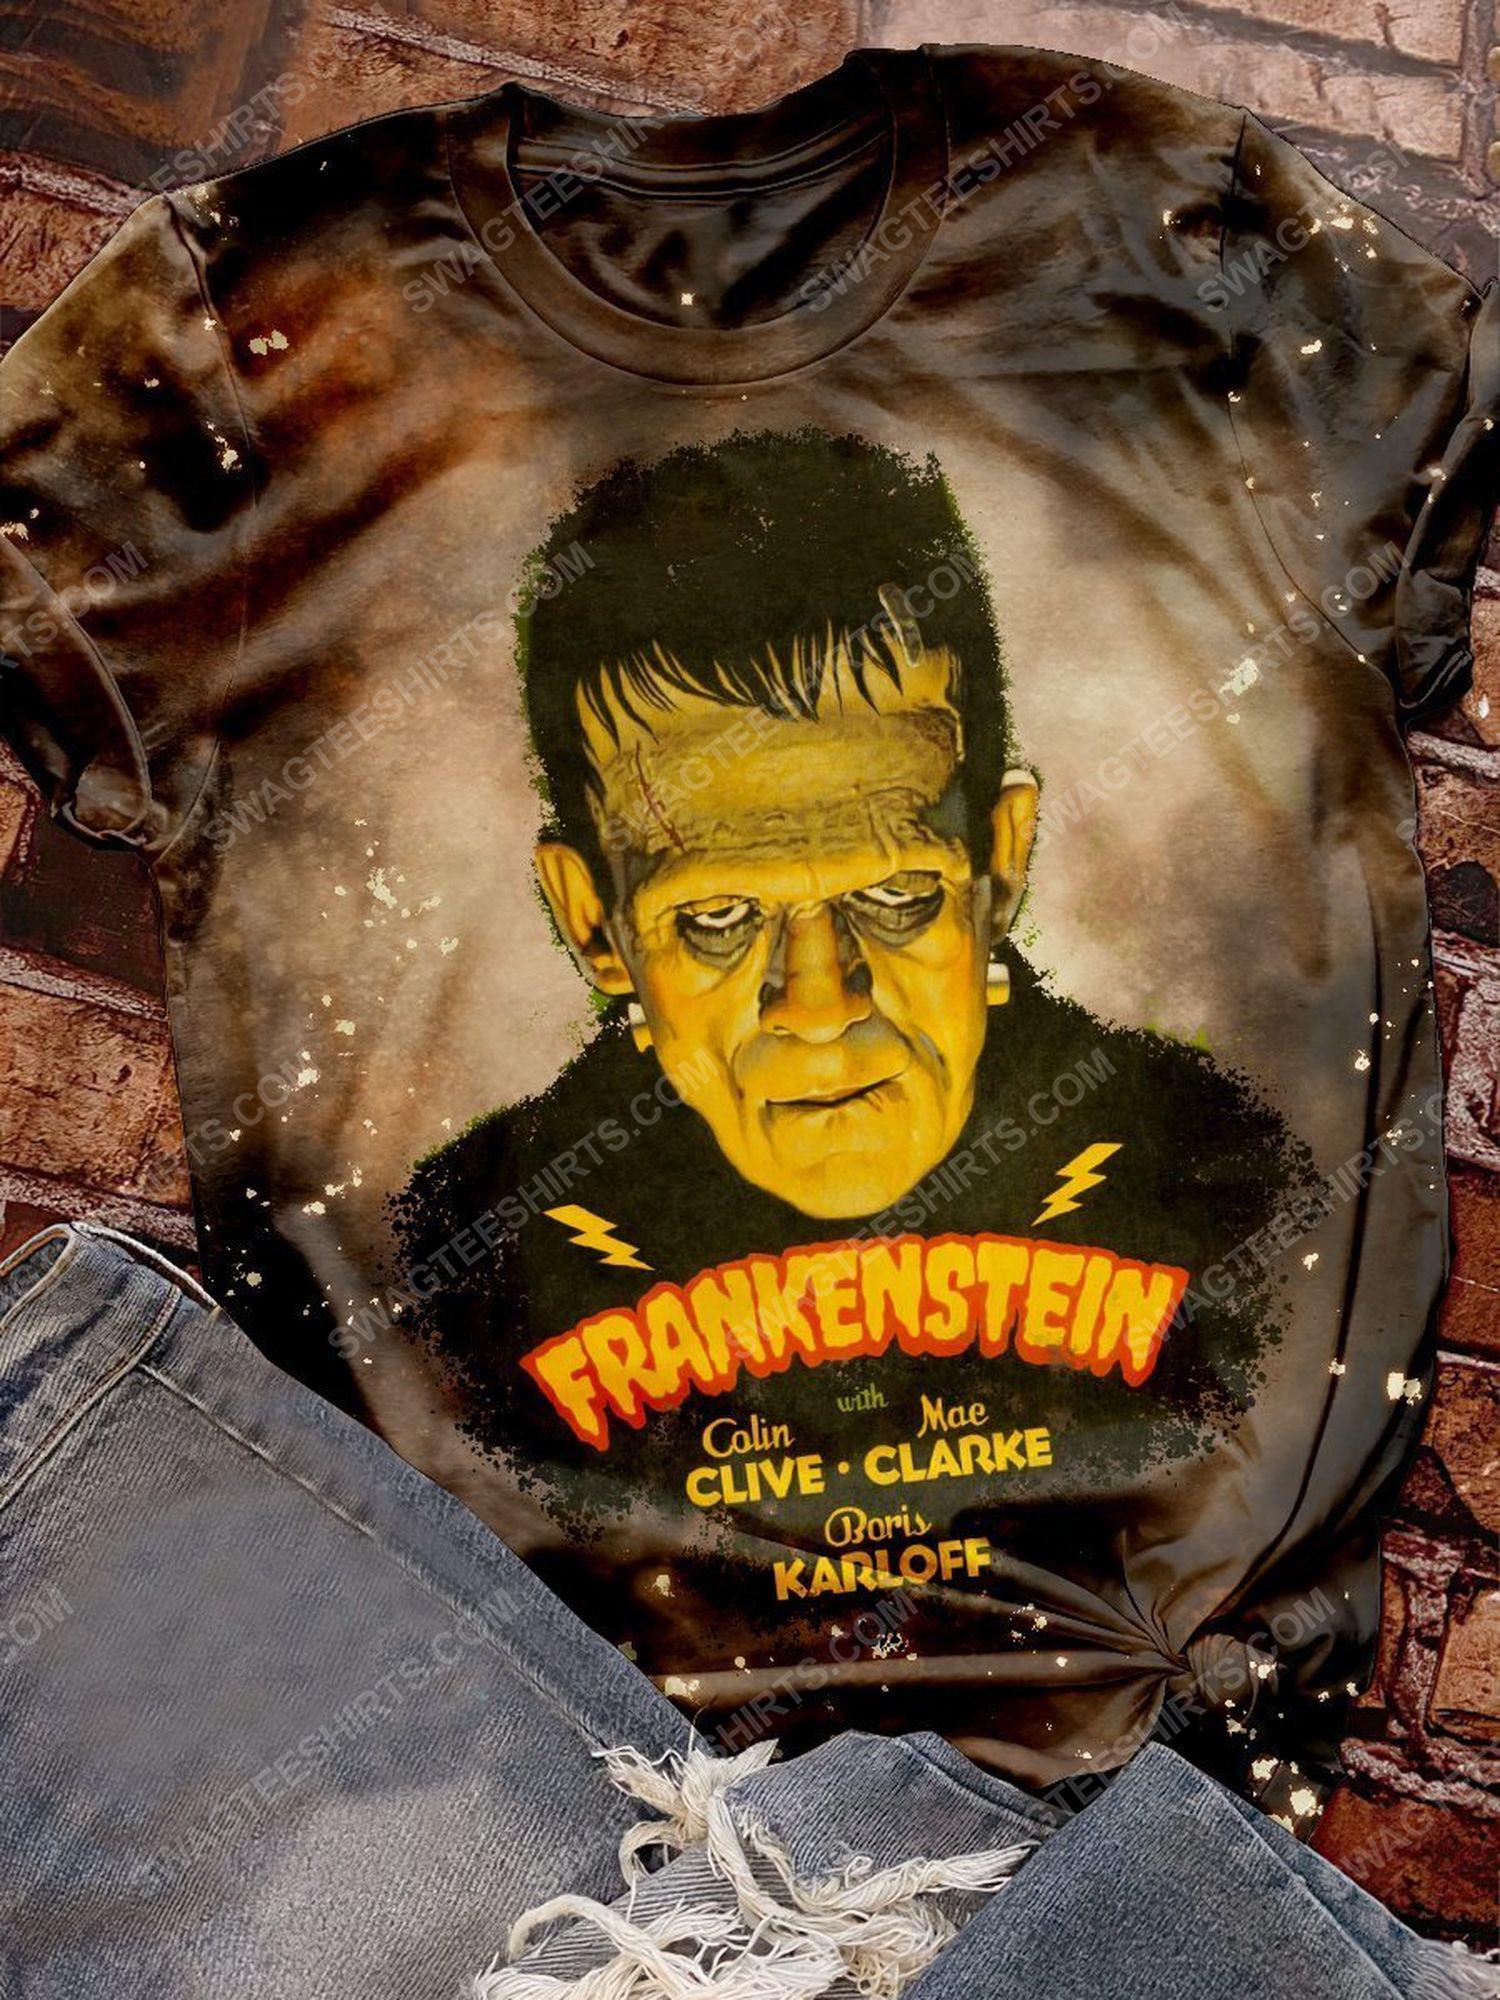 Halloween night and frankenstein movie bleached shirt 1 - Copy